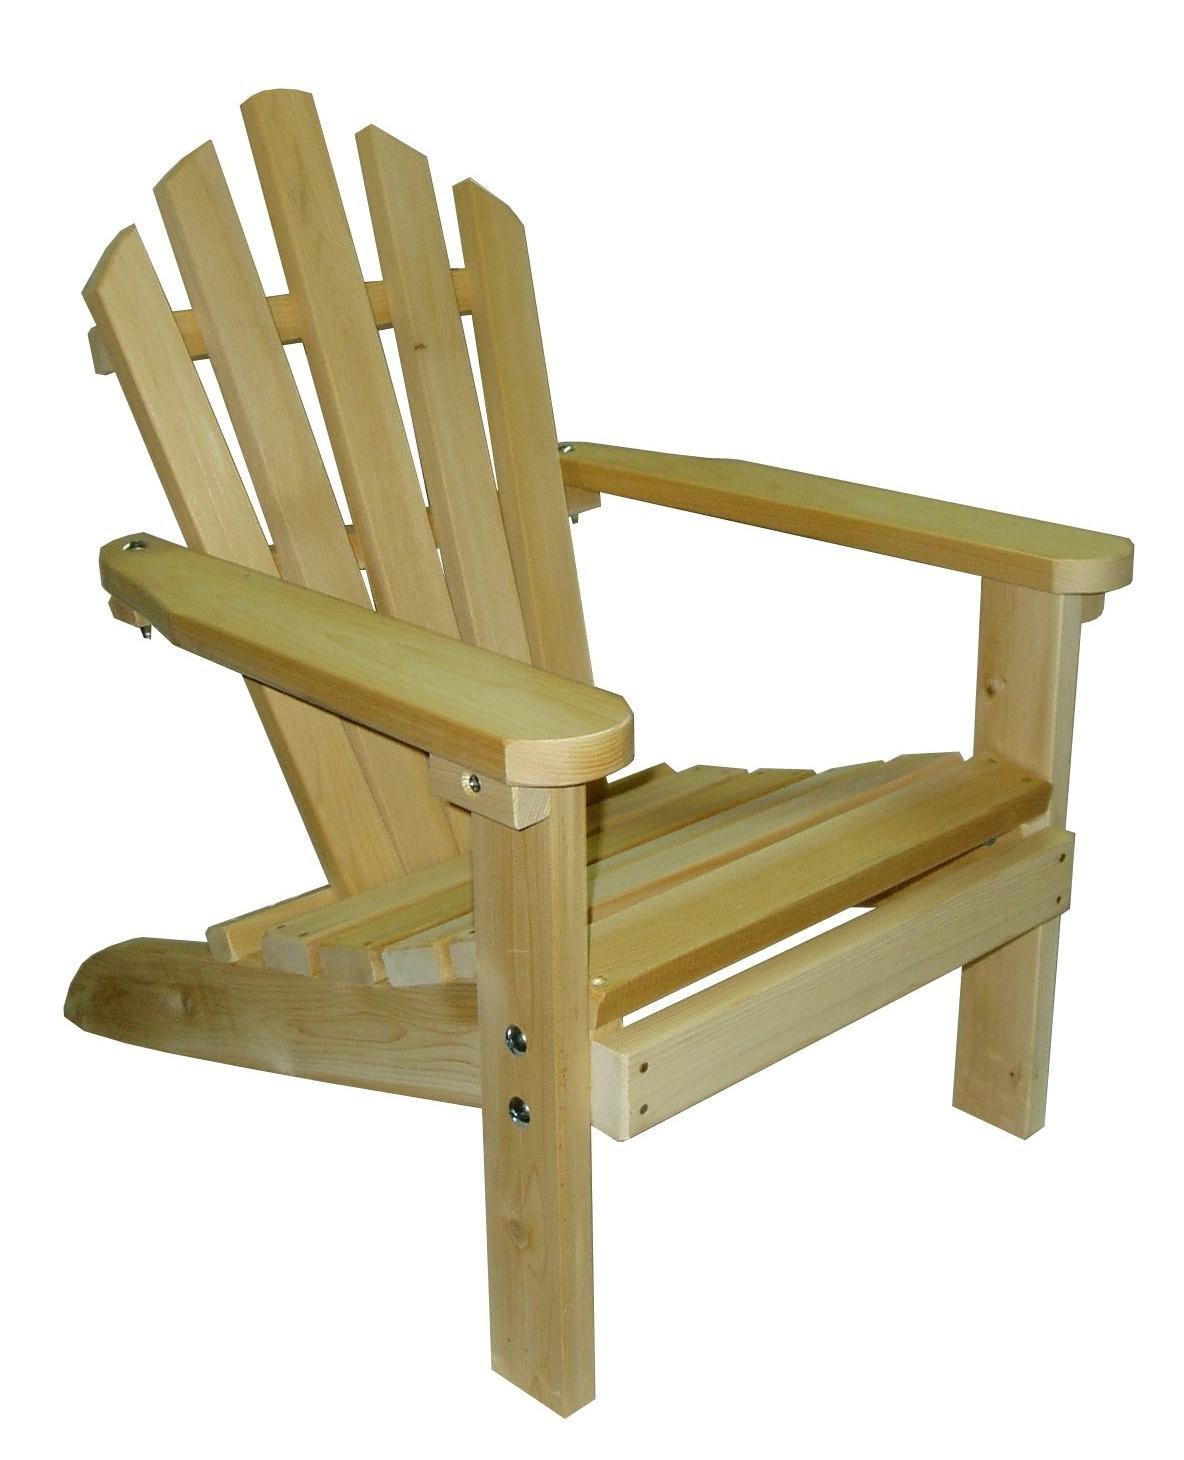 Chair Westport Fauteuil De Muskoka Adirondack Jardin Bois En ... dedans Fauteuil De Jardin Bois Adirondack